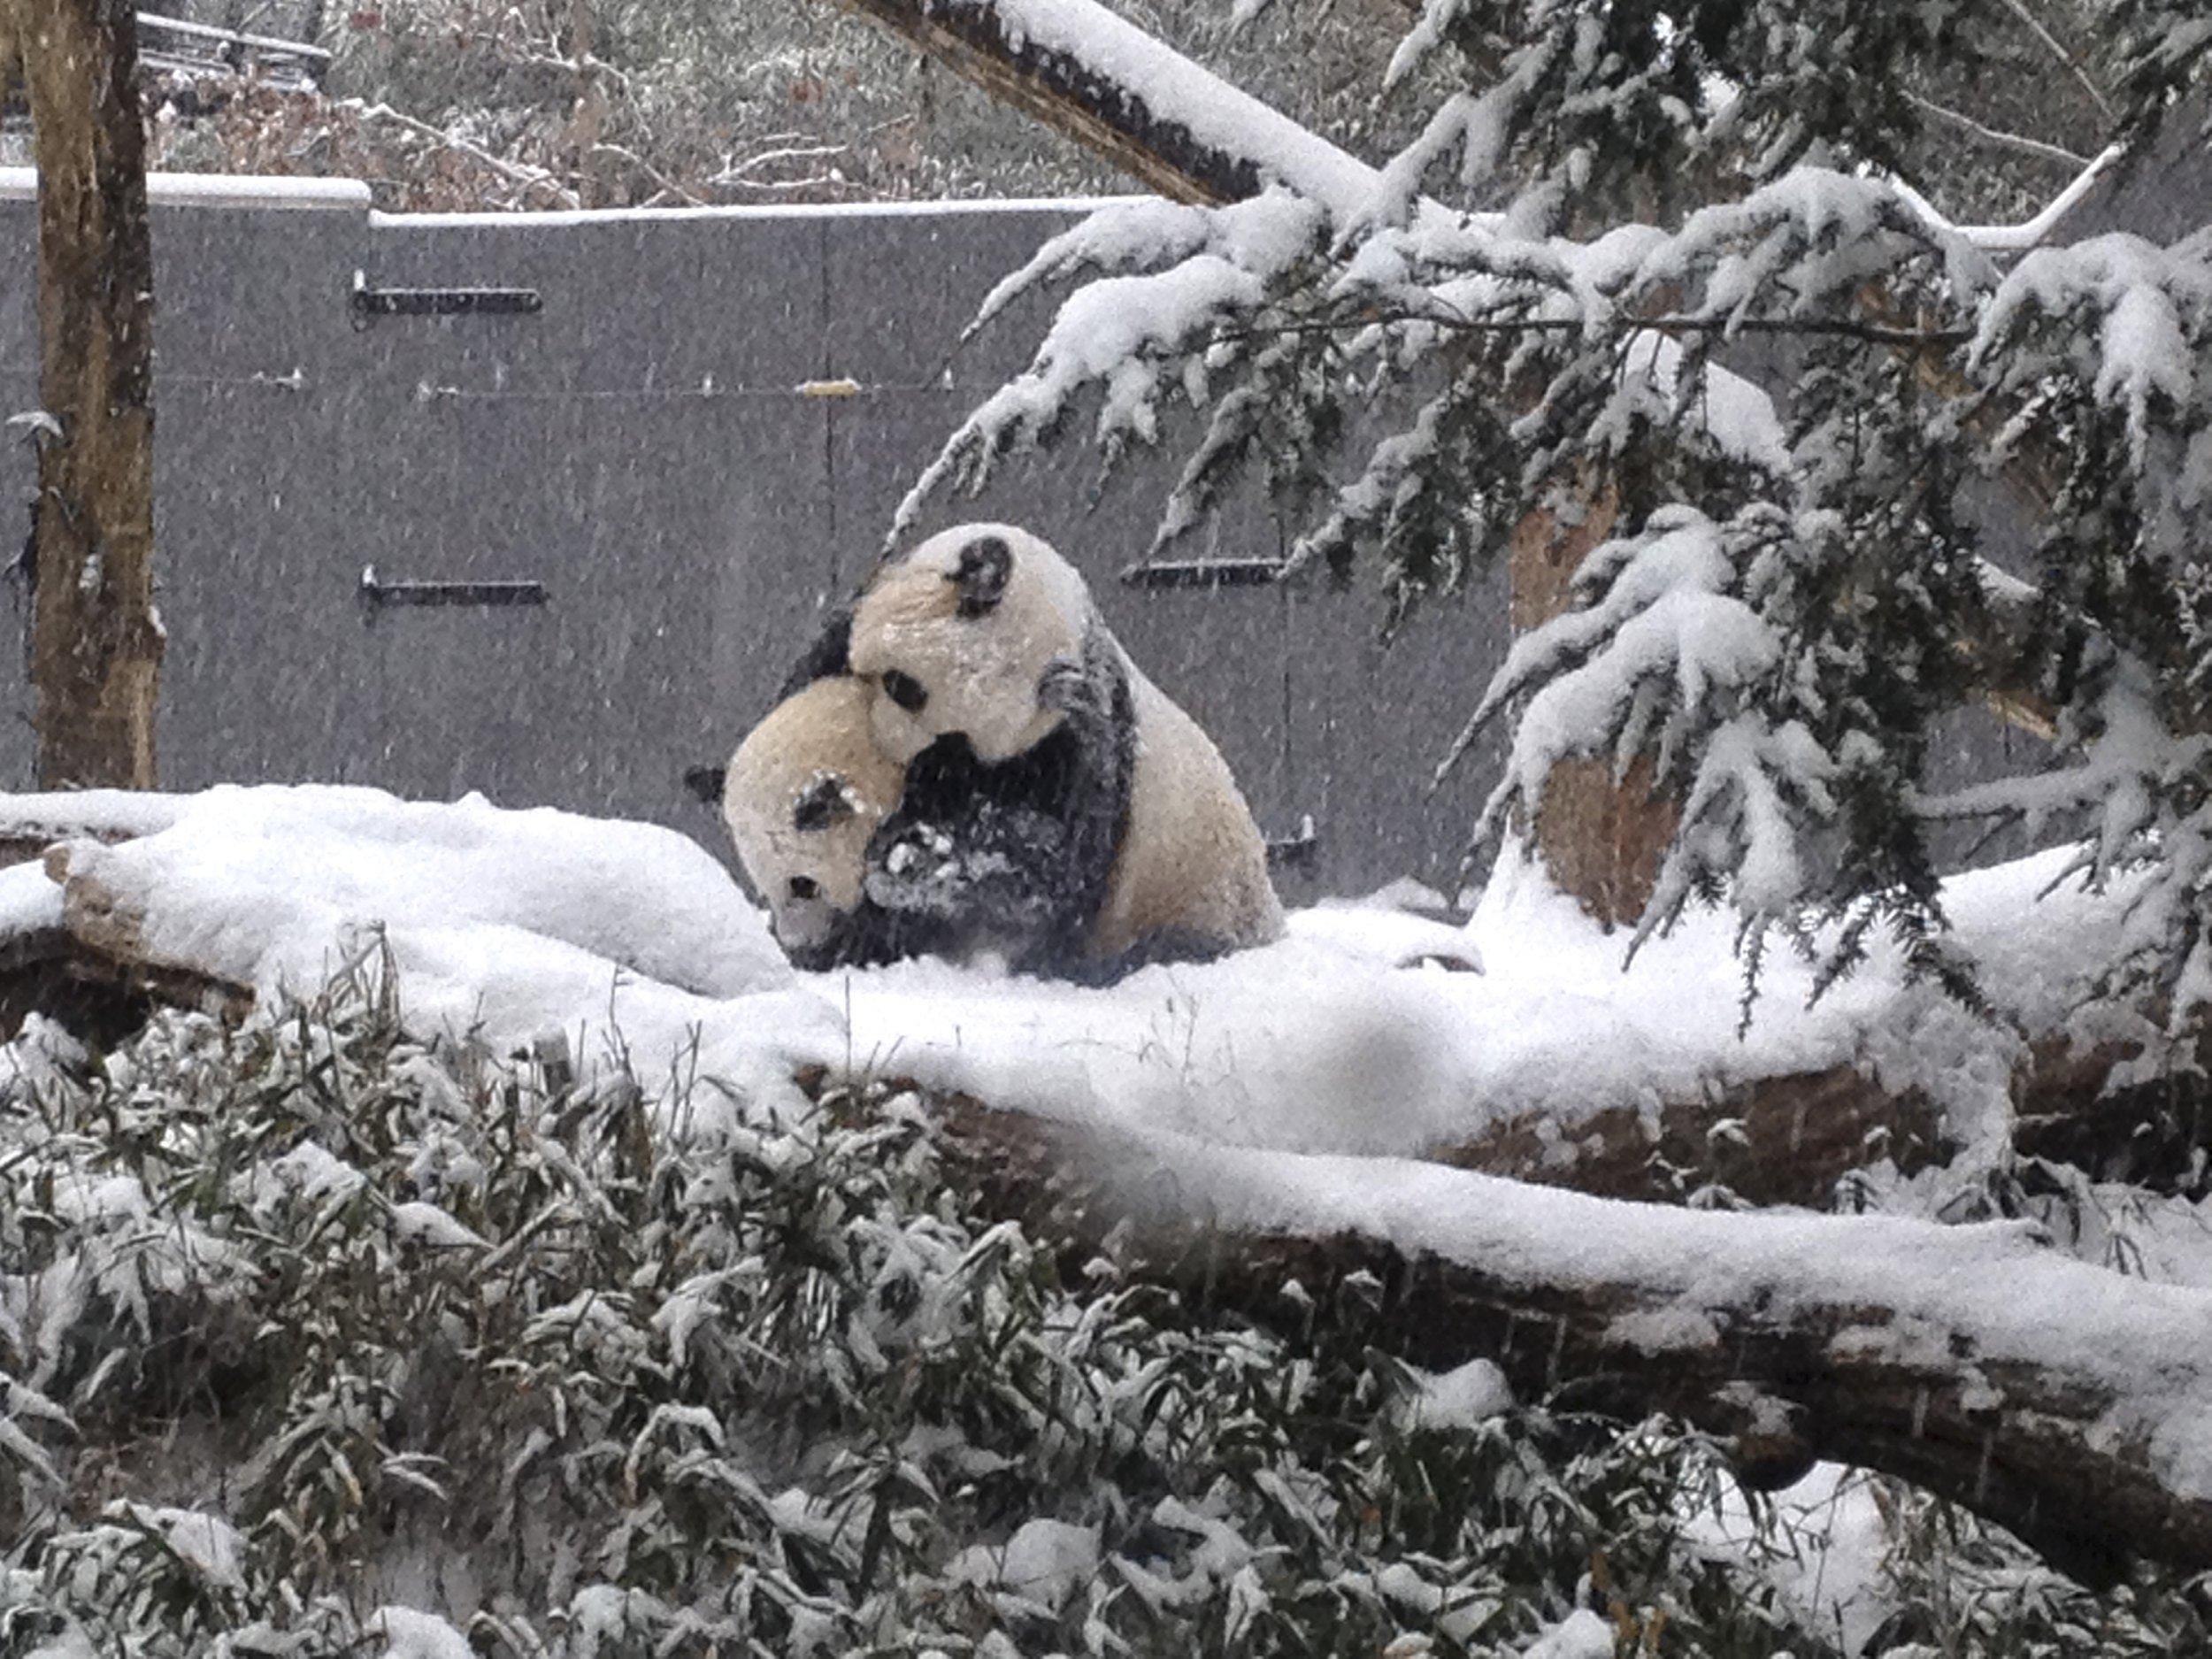 Pandas in the Snow